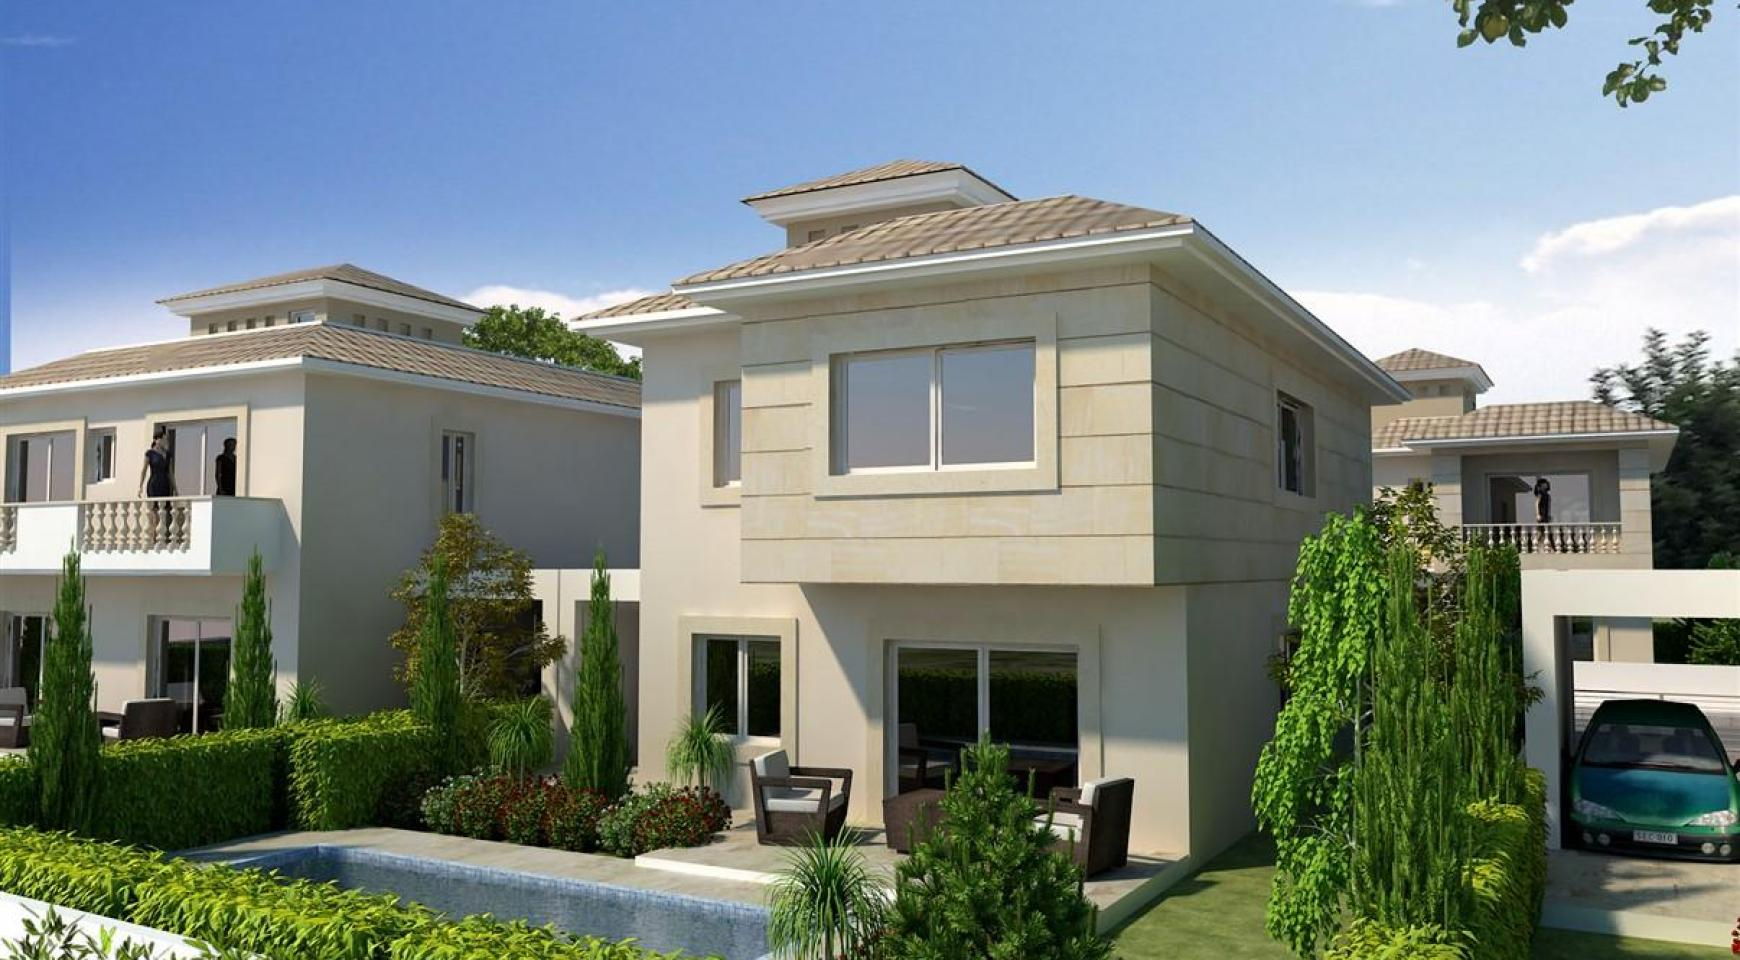 Modern 3 Bedroom Villa in New Project in Paphos - 11